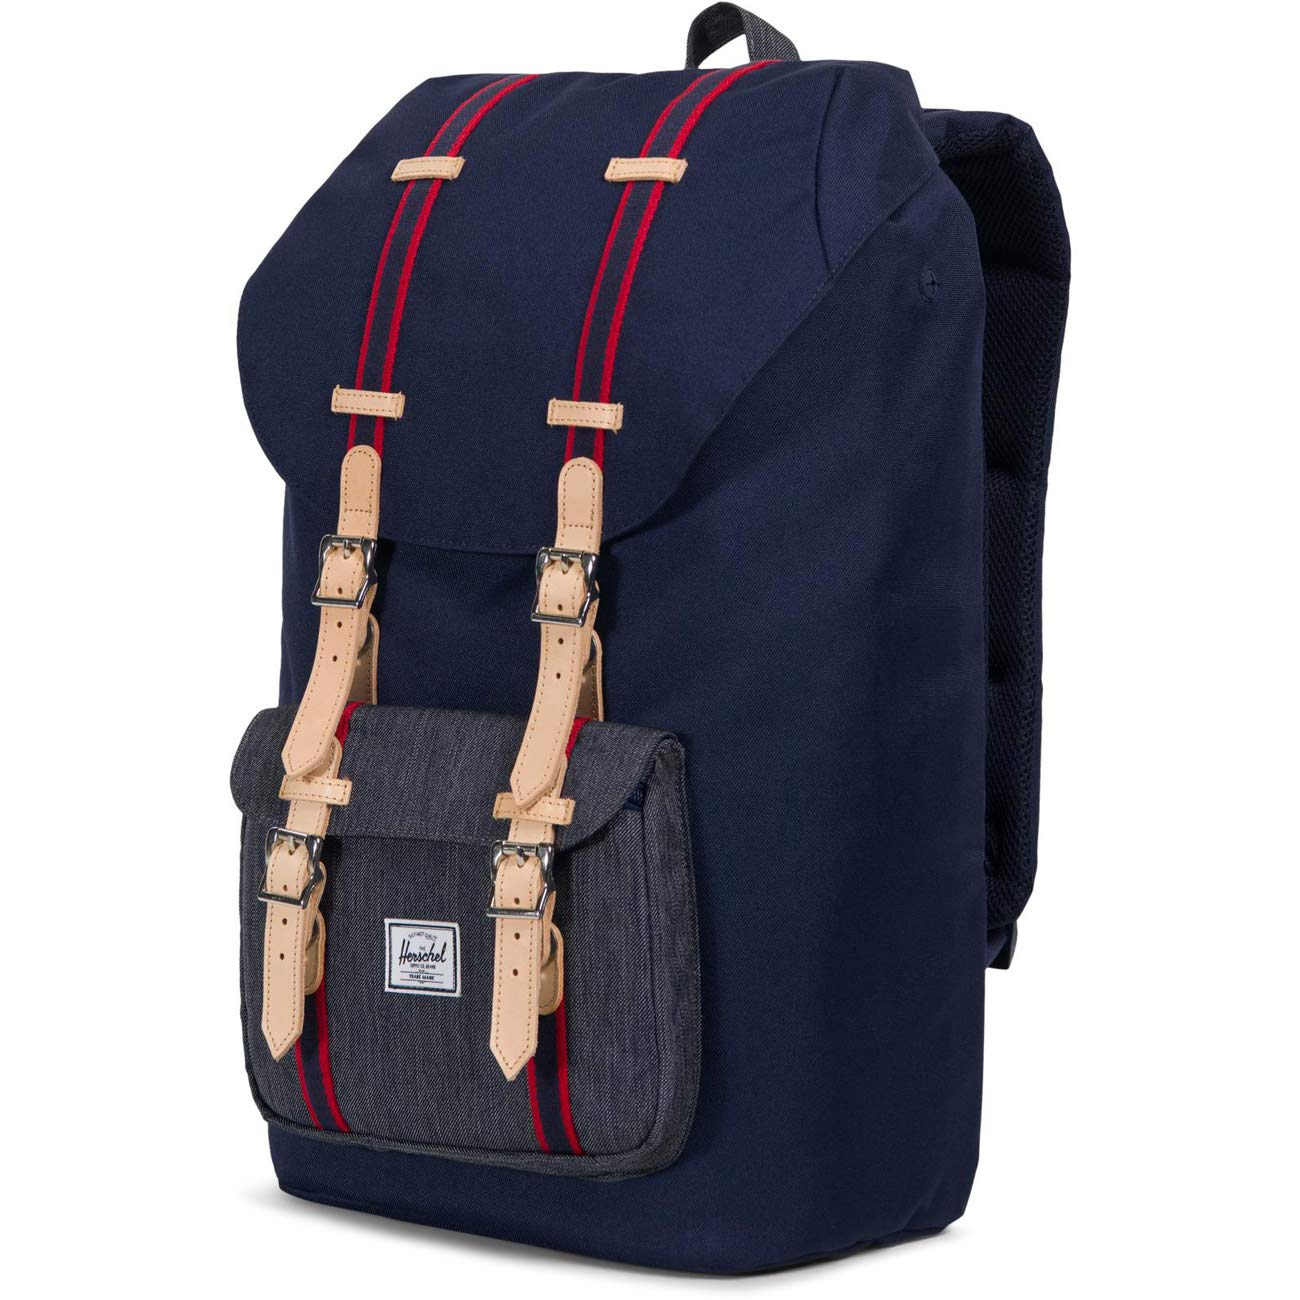 , Drawcord Zip Black Fabric,Rucksack Backpack Bags Herschel Little America Rubber Brown Fabric, Rubber, Black, Brown, White, Unisex, 38.1/cm 15